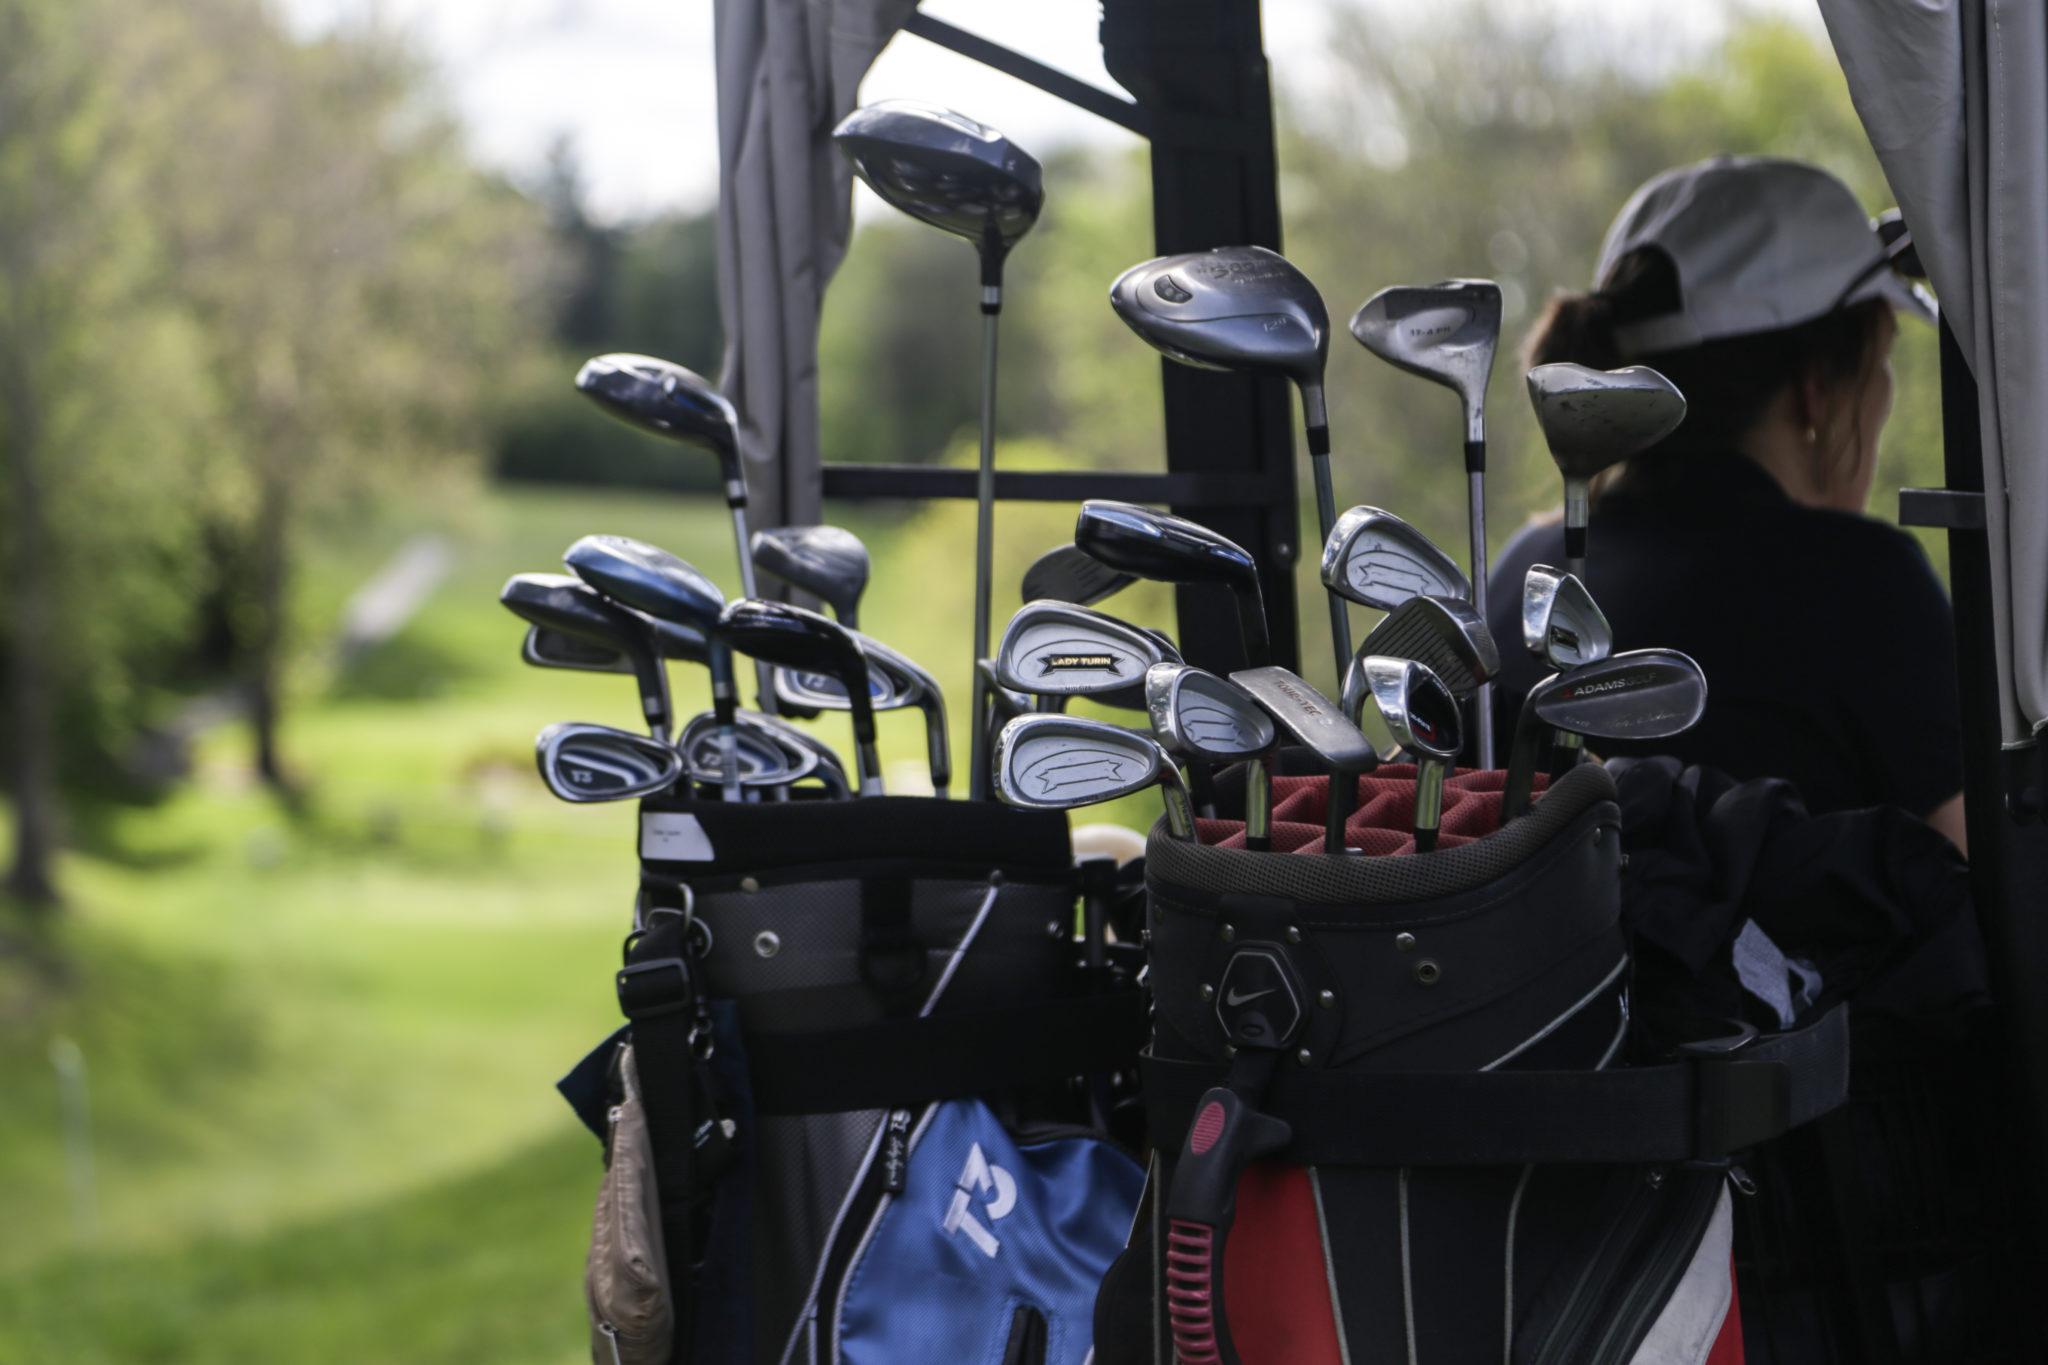 golf clubs on golf cart photo